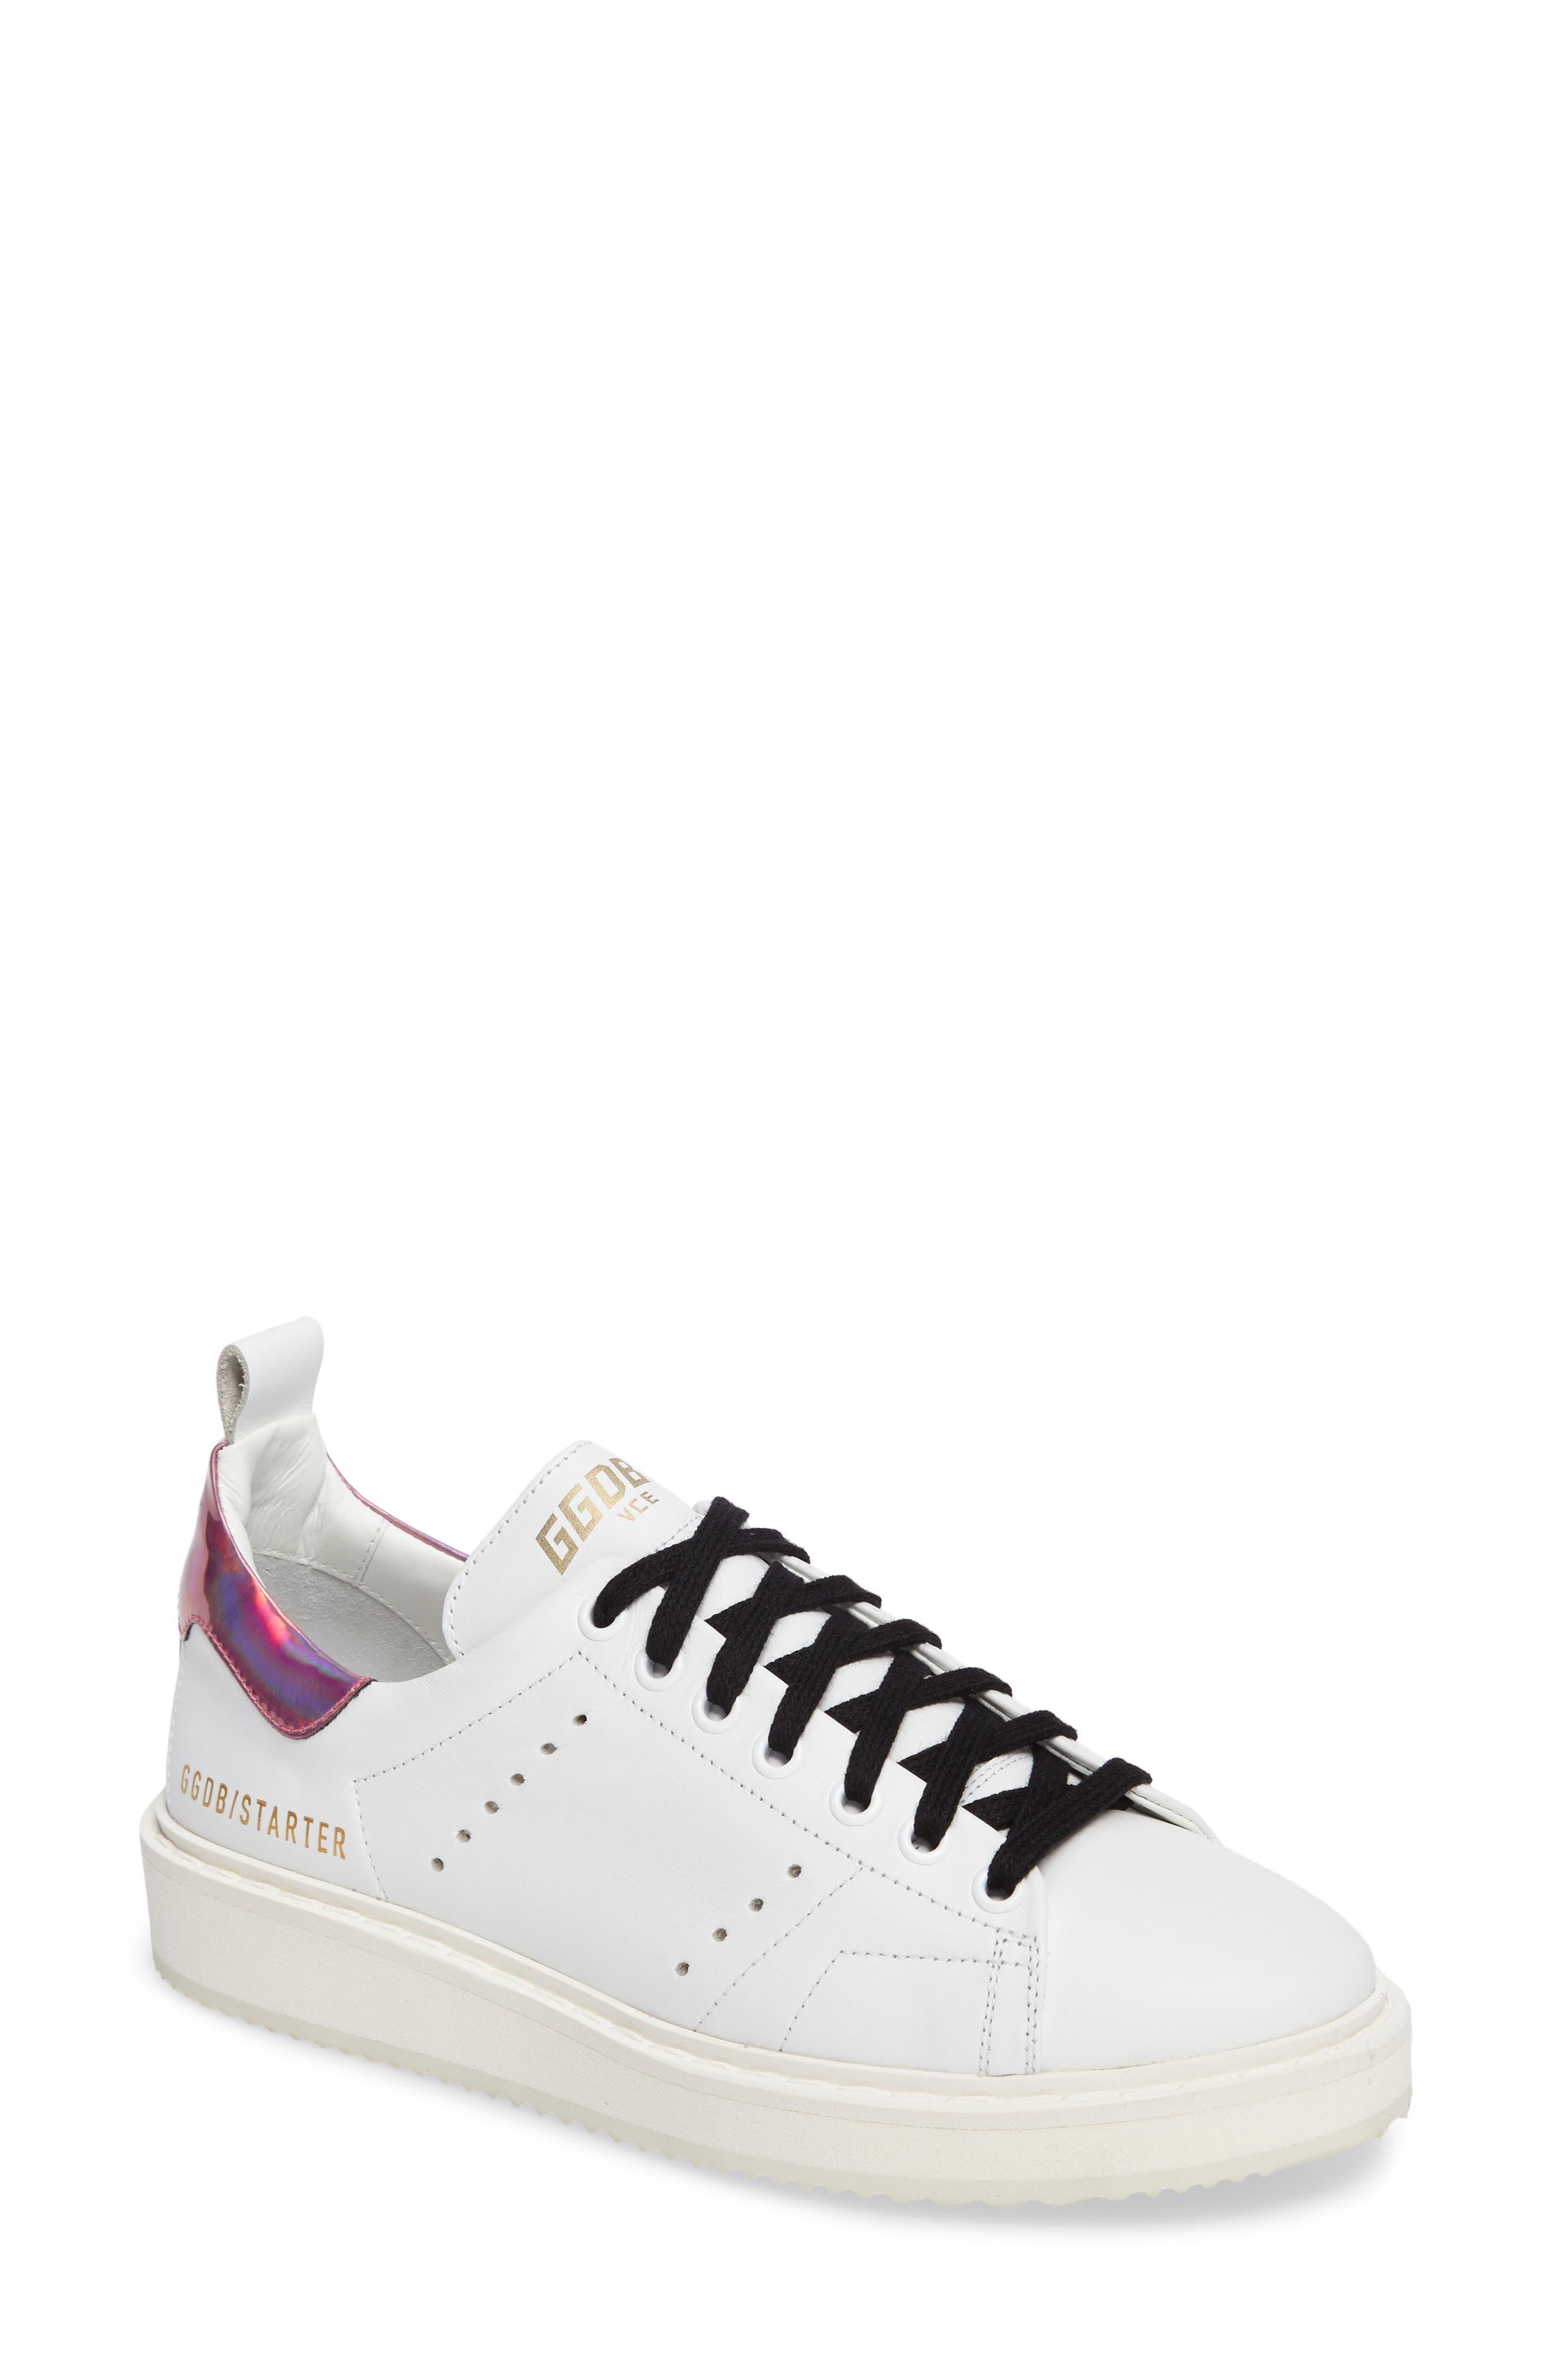 Starter Low Top Sneaker,                             Main thumbnail 1, color,                             100